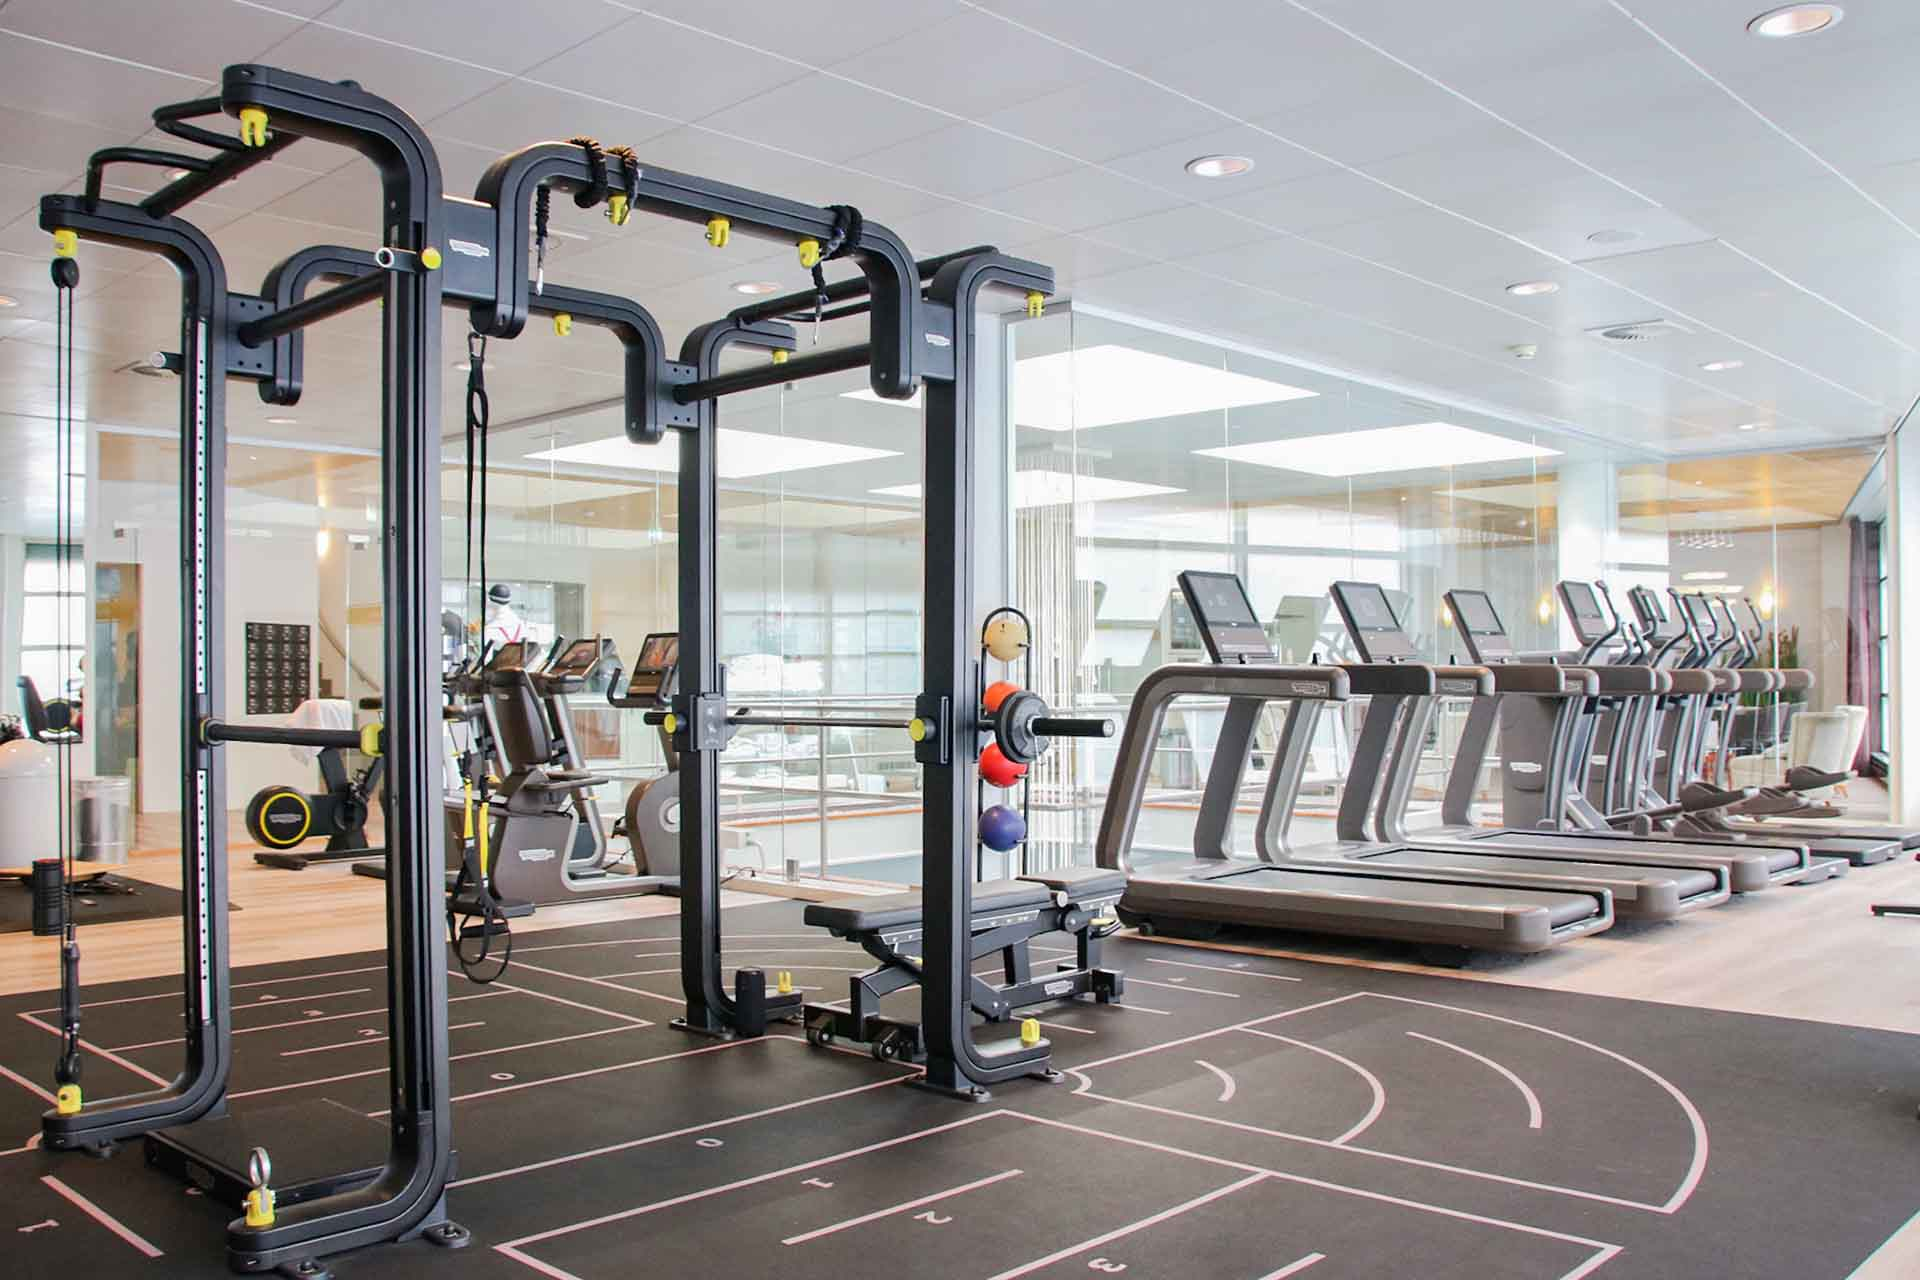 Fitness equipment at Nagomi Health